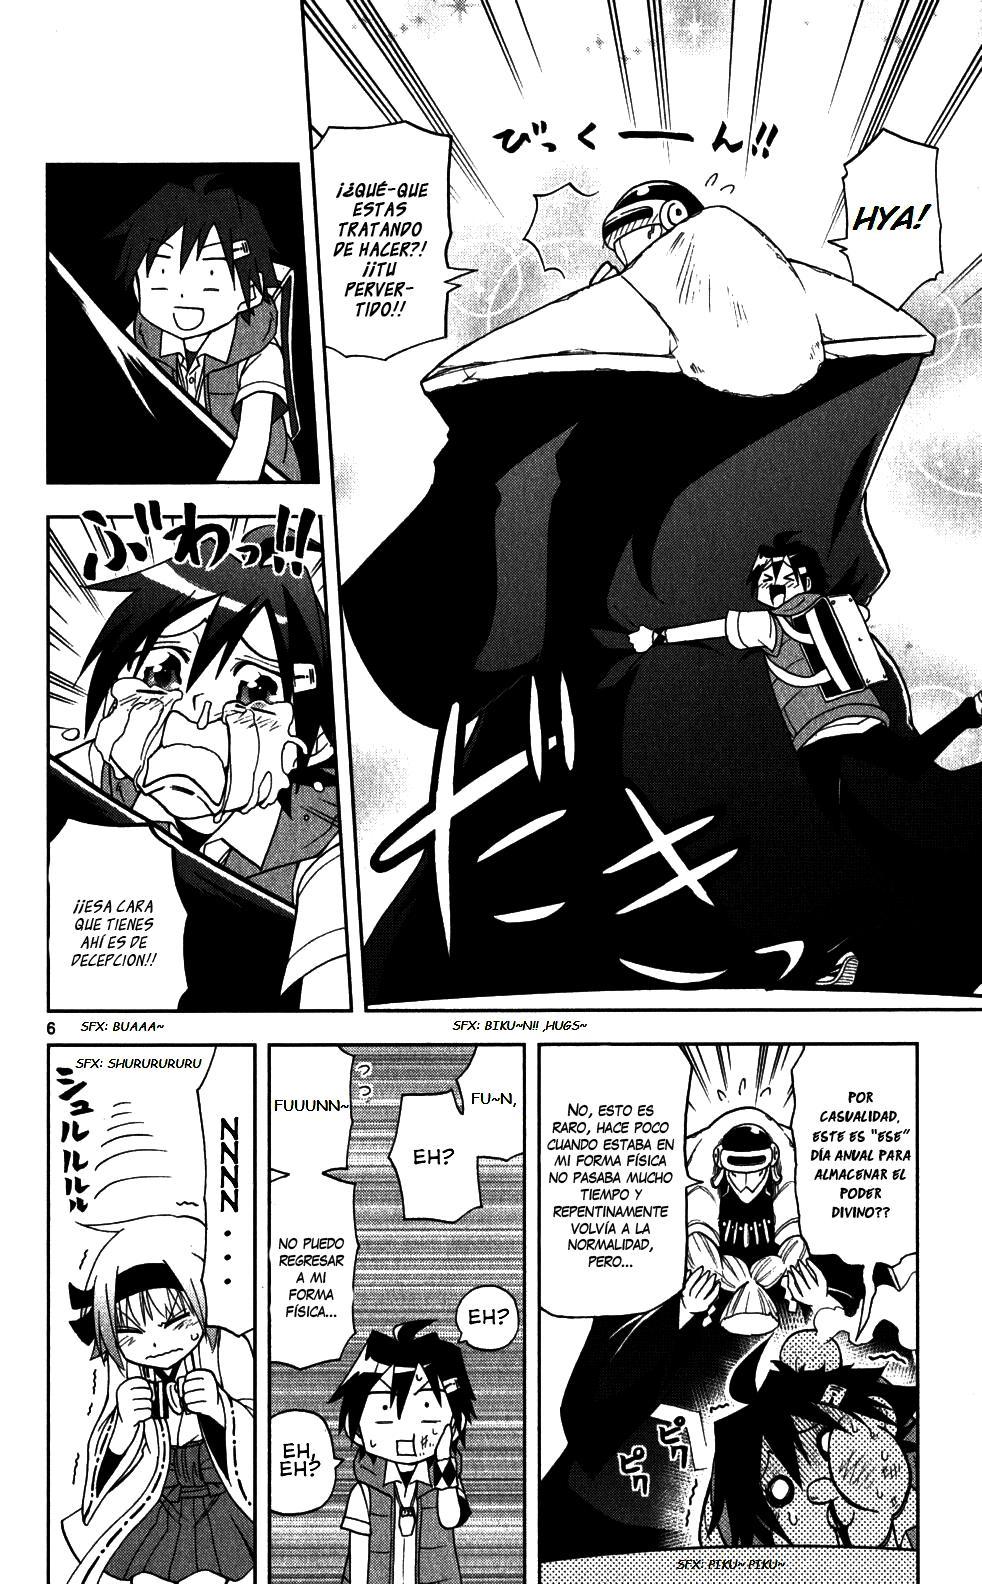 http://c5.ninemanga.com/es_manga/19/14419/421569/50011d0dfb7fef8a77b64b35d7a8cd22.jpg Page 7